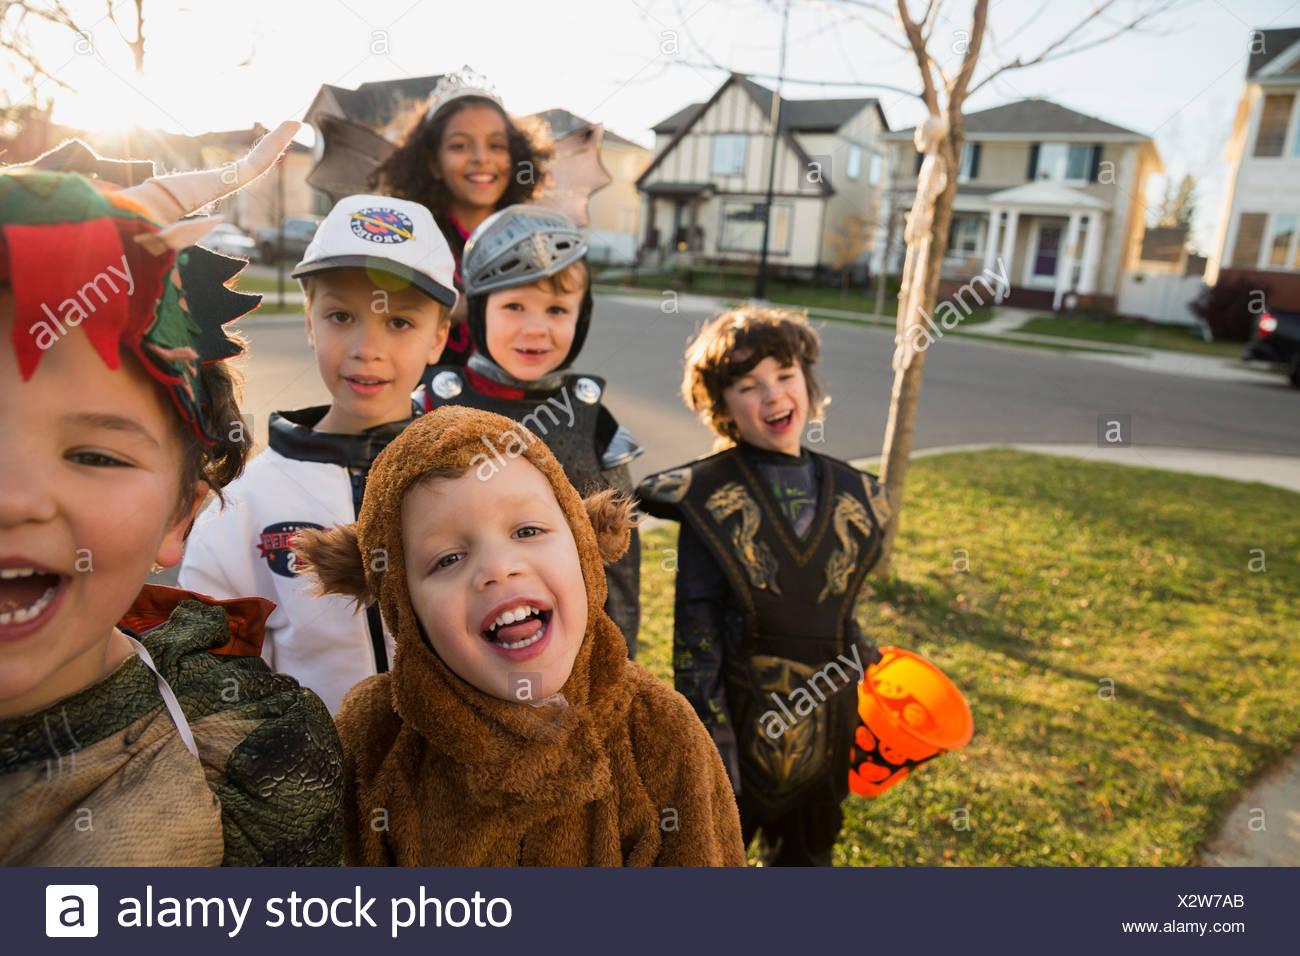 Porträt begeisterte Kinder in Halloween-Kostümen Stockbild